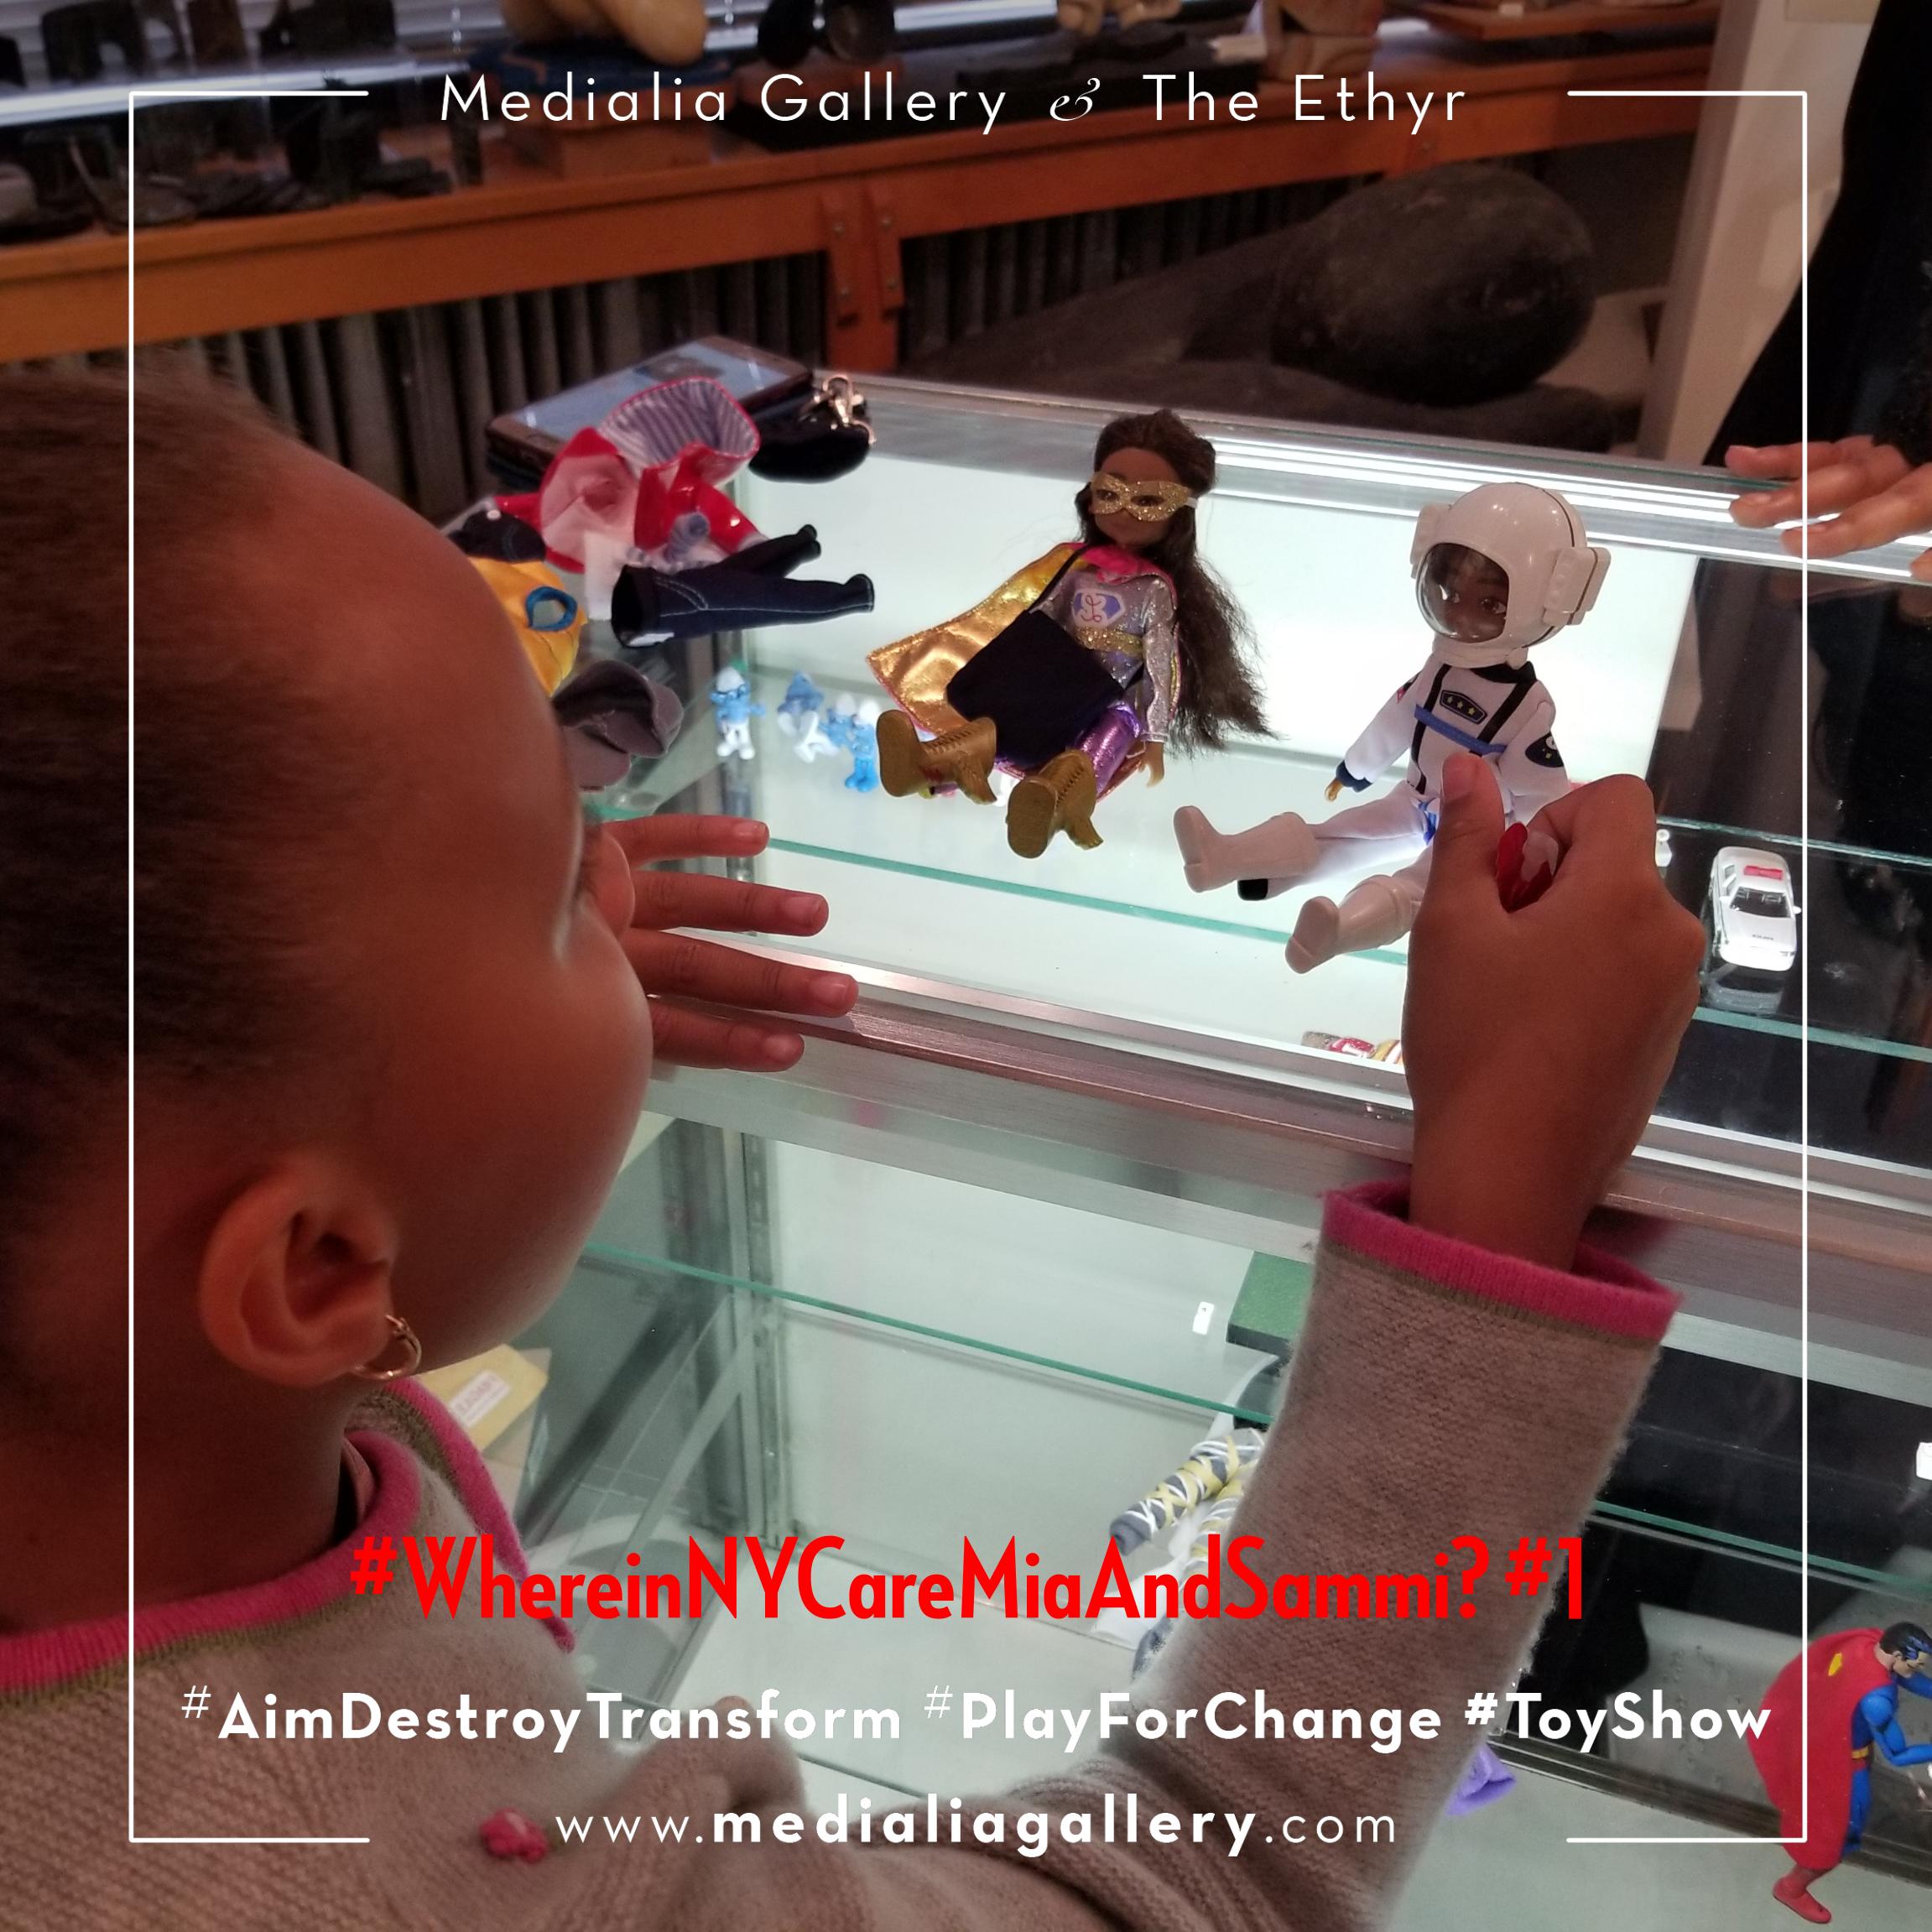 WhereinNYCareMiaAndSammi_Lottie_Dolls_Medialia_The_Ethyr_ToyShow_1.4.png